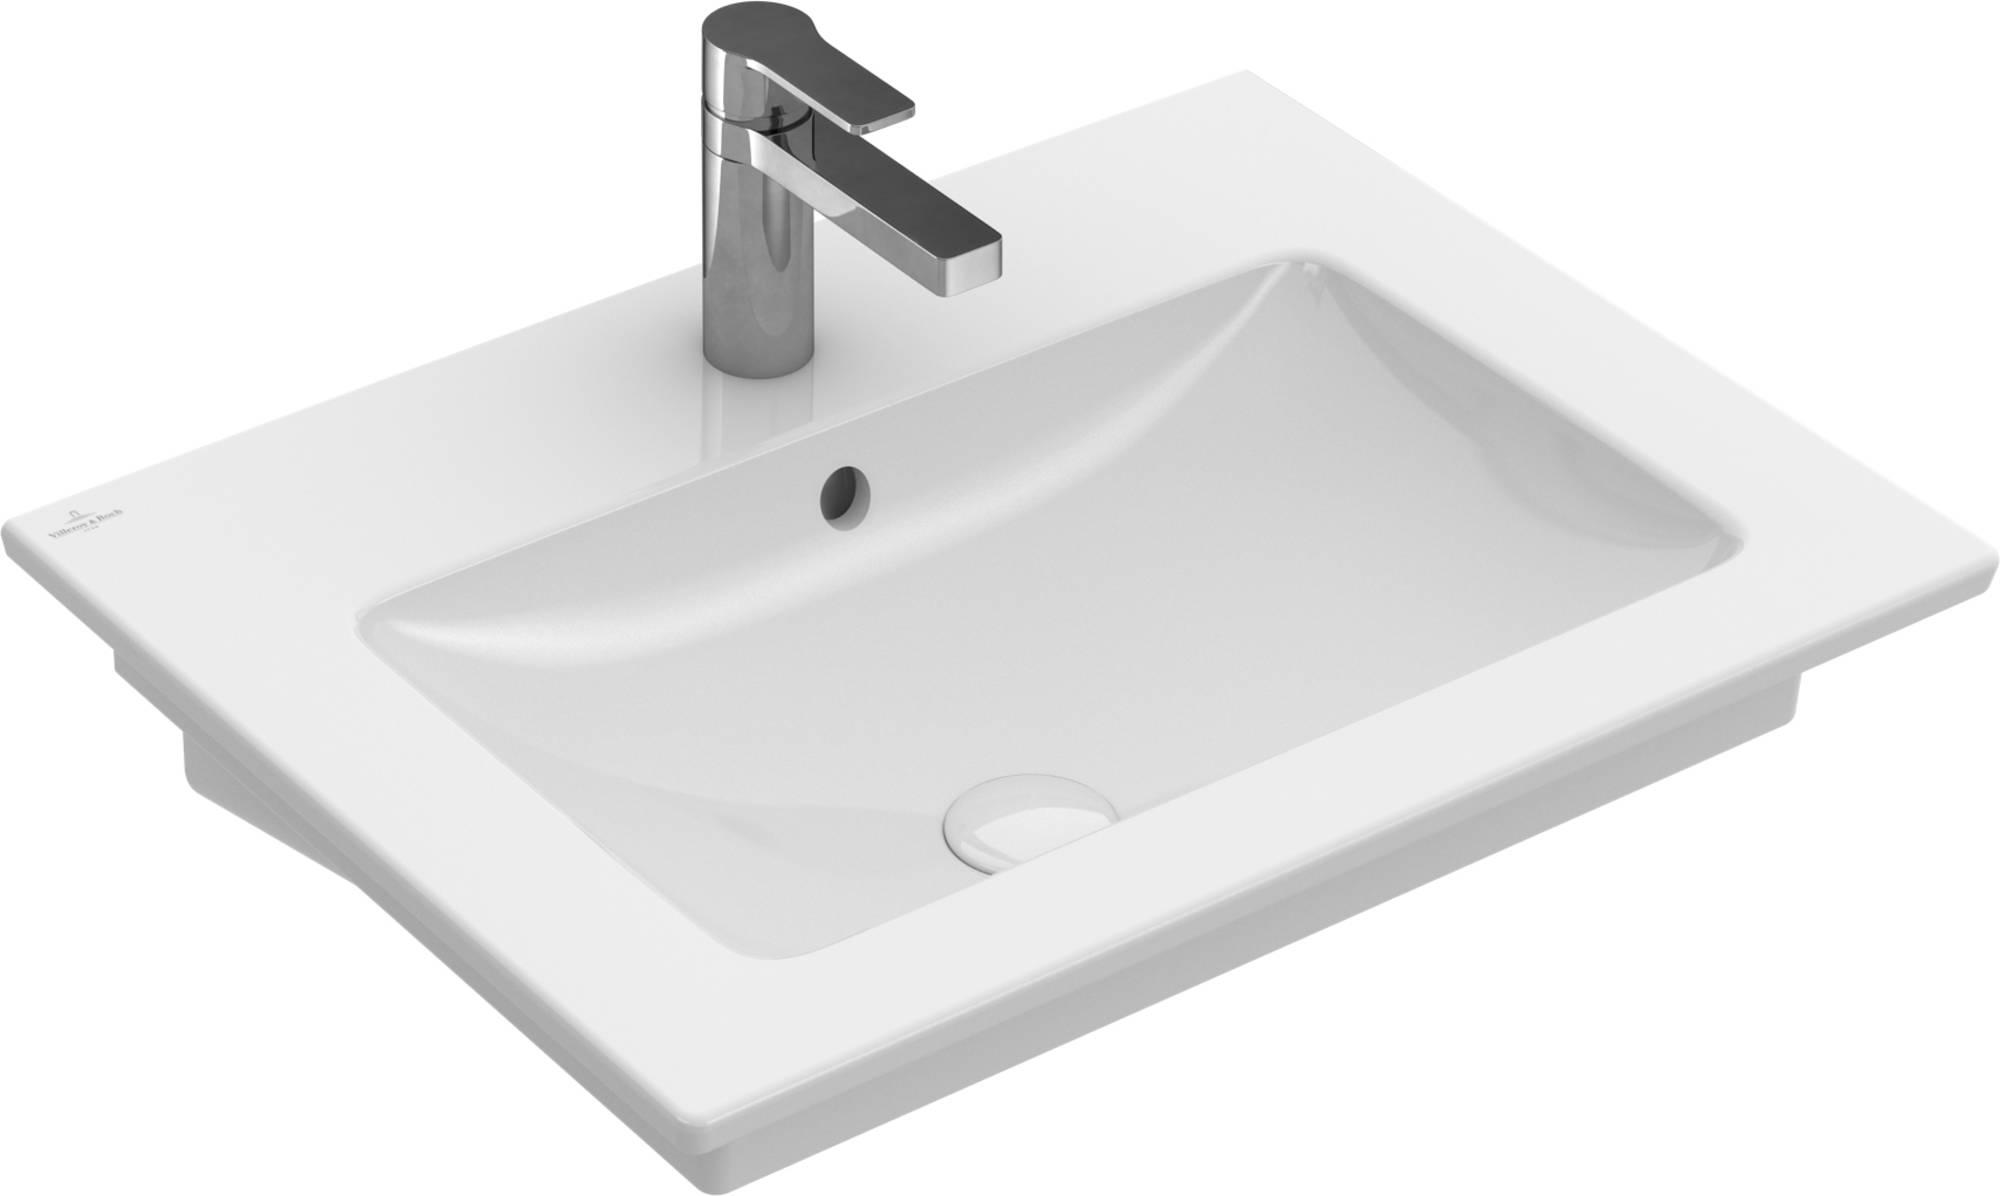 Villeroy&Boch Venticello Wastafel Keramiek 50x65 cm Wit Alpin CeramicPlus